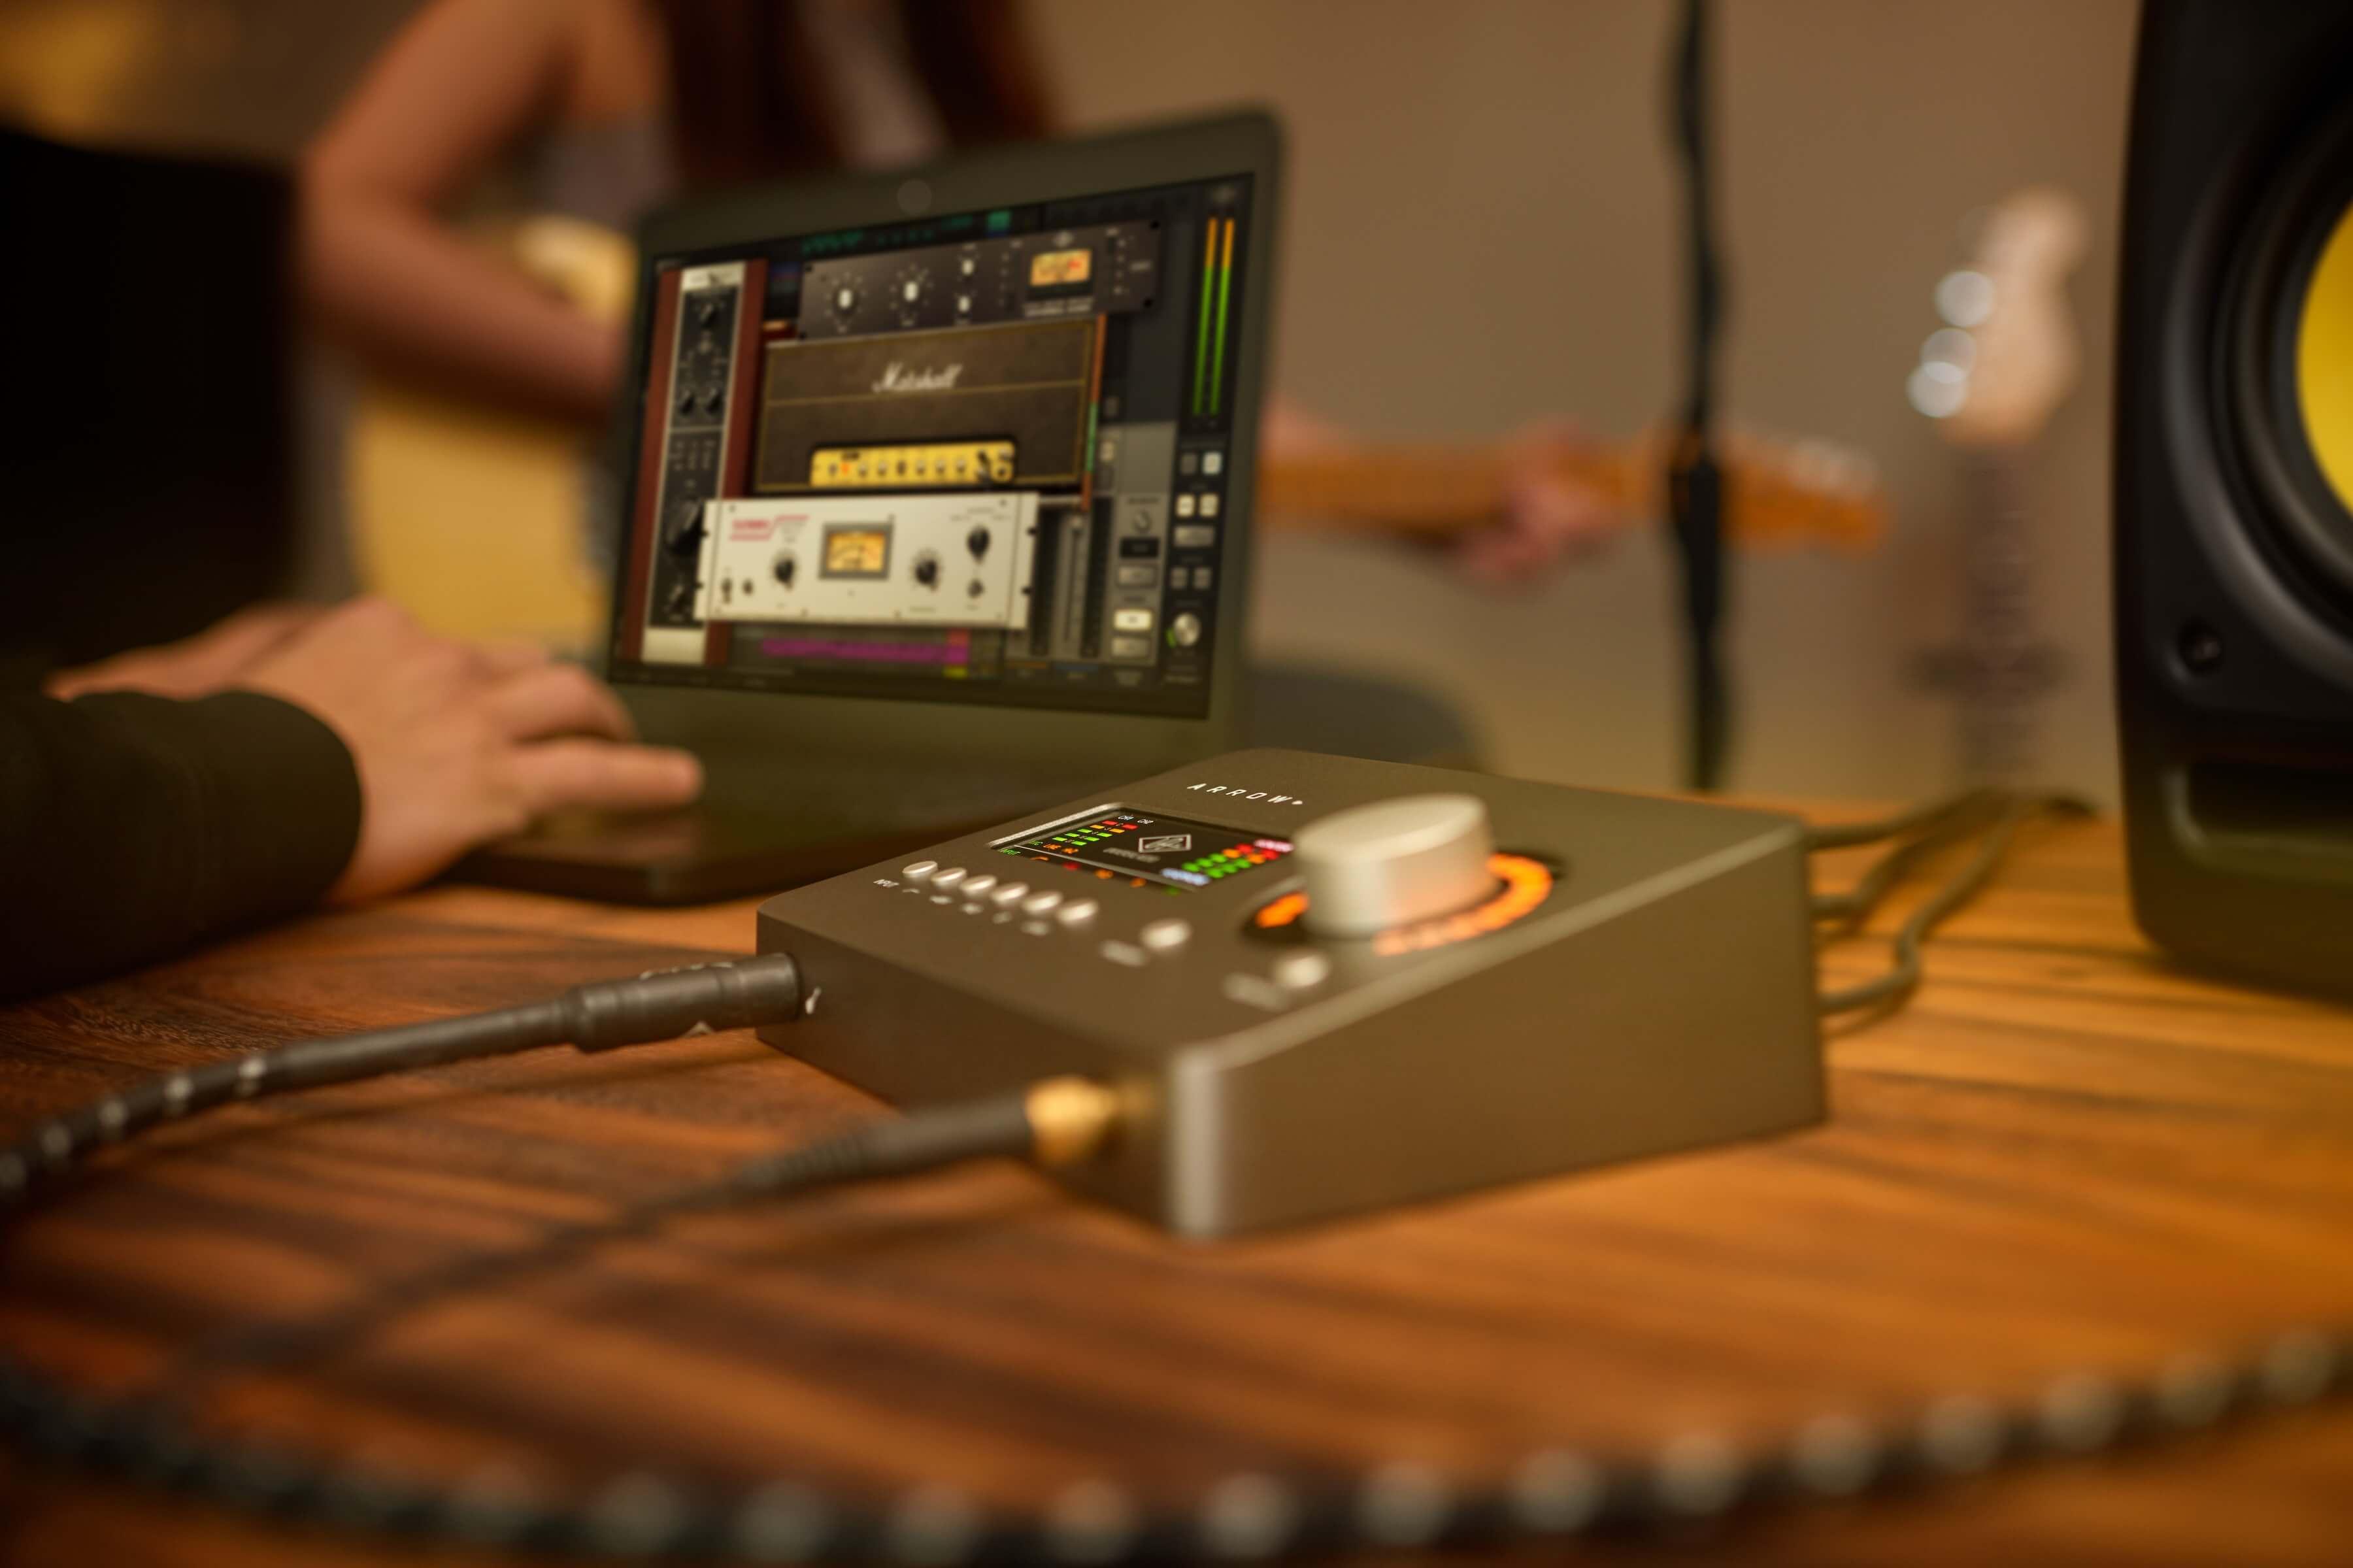 universal audio ships arrow desktop audio interface. Black Bedroom Furniture Sets. Home Design Ideas